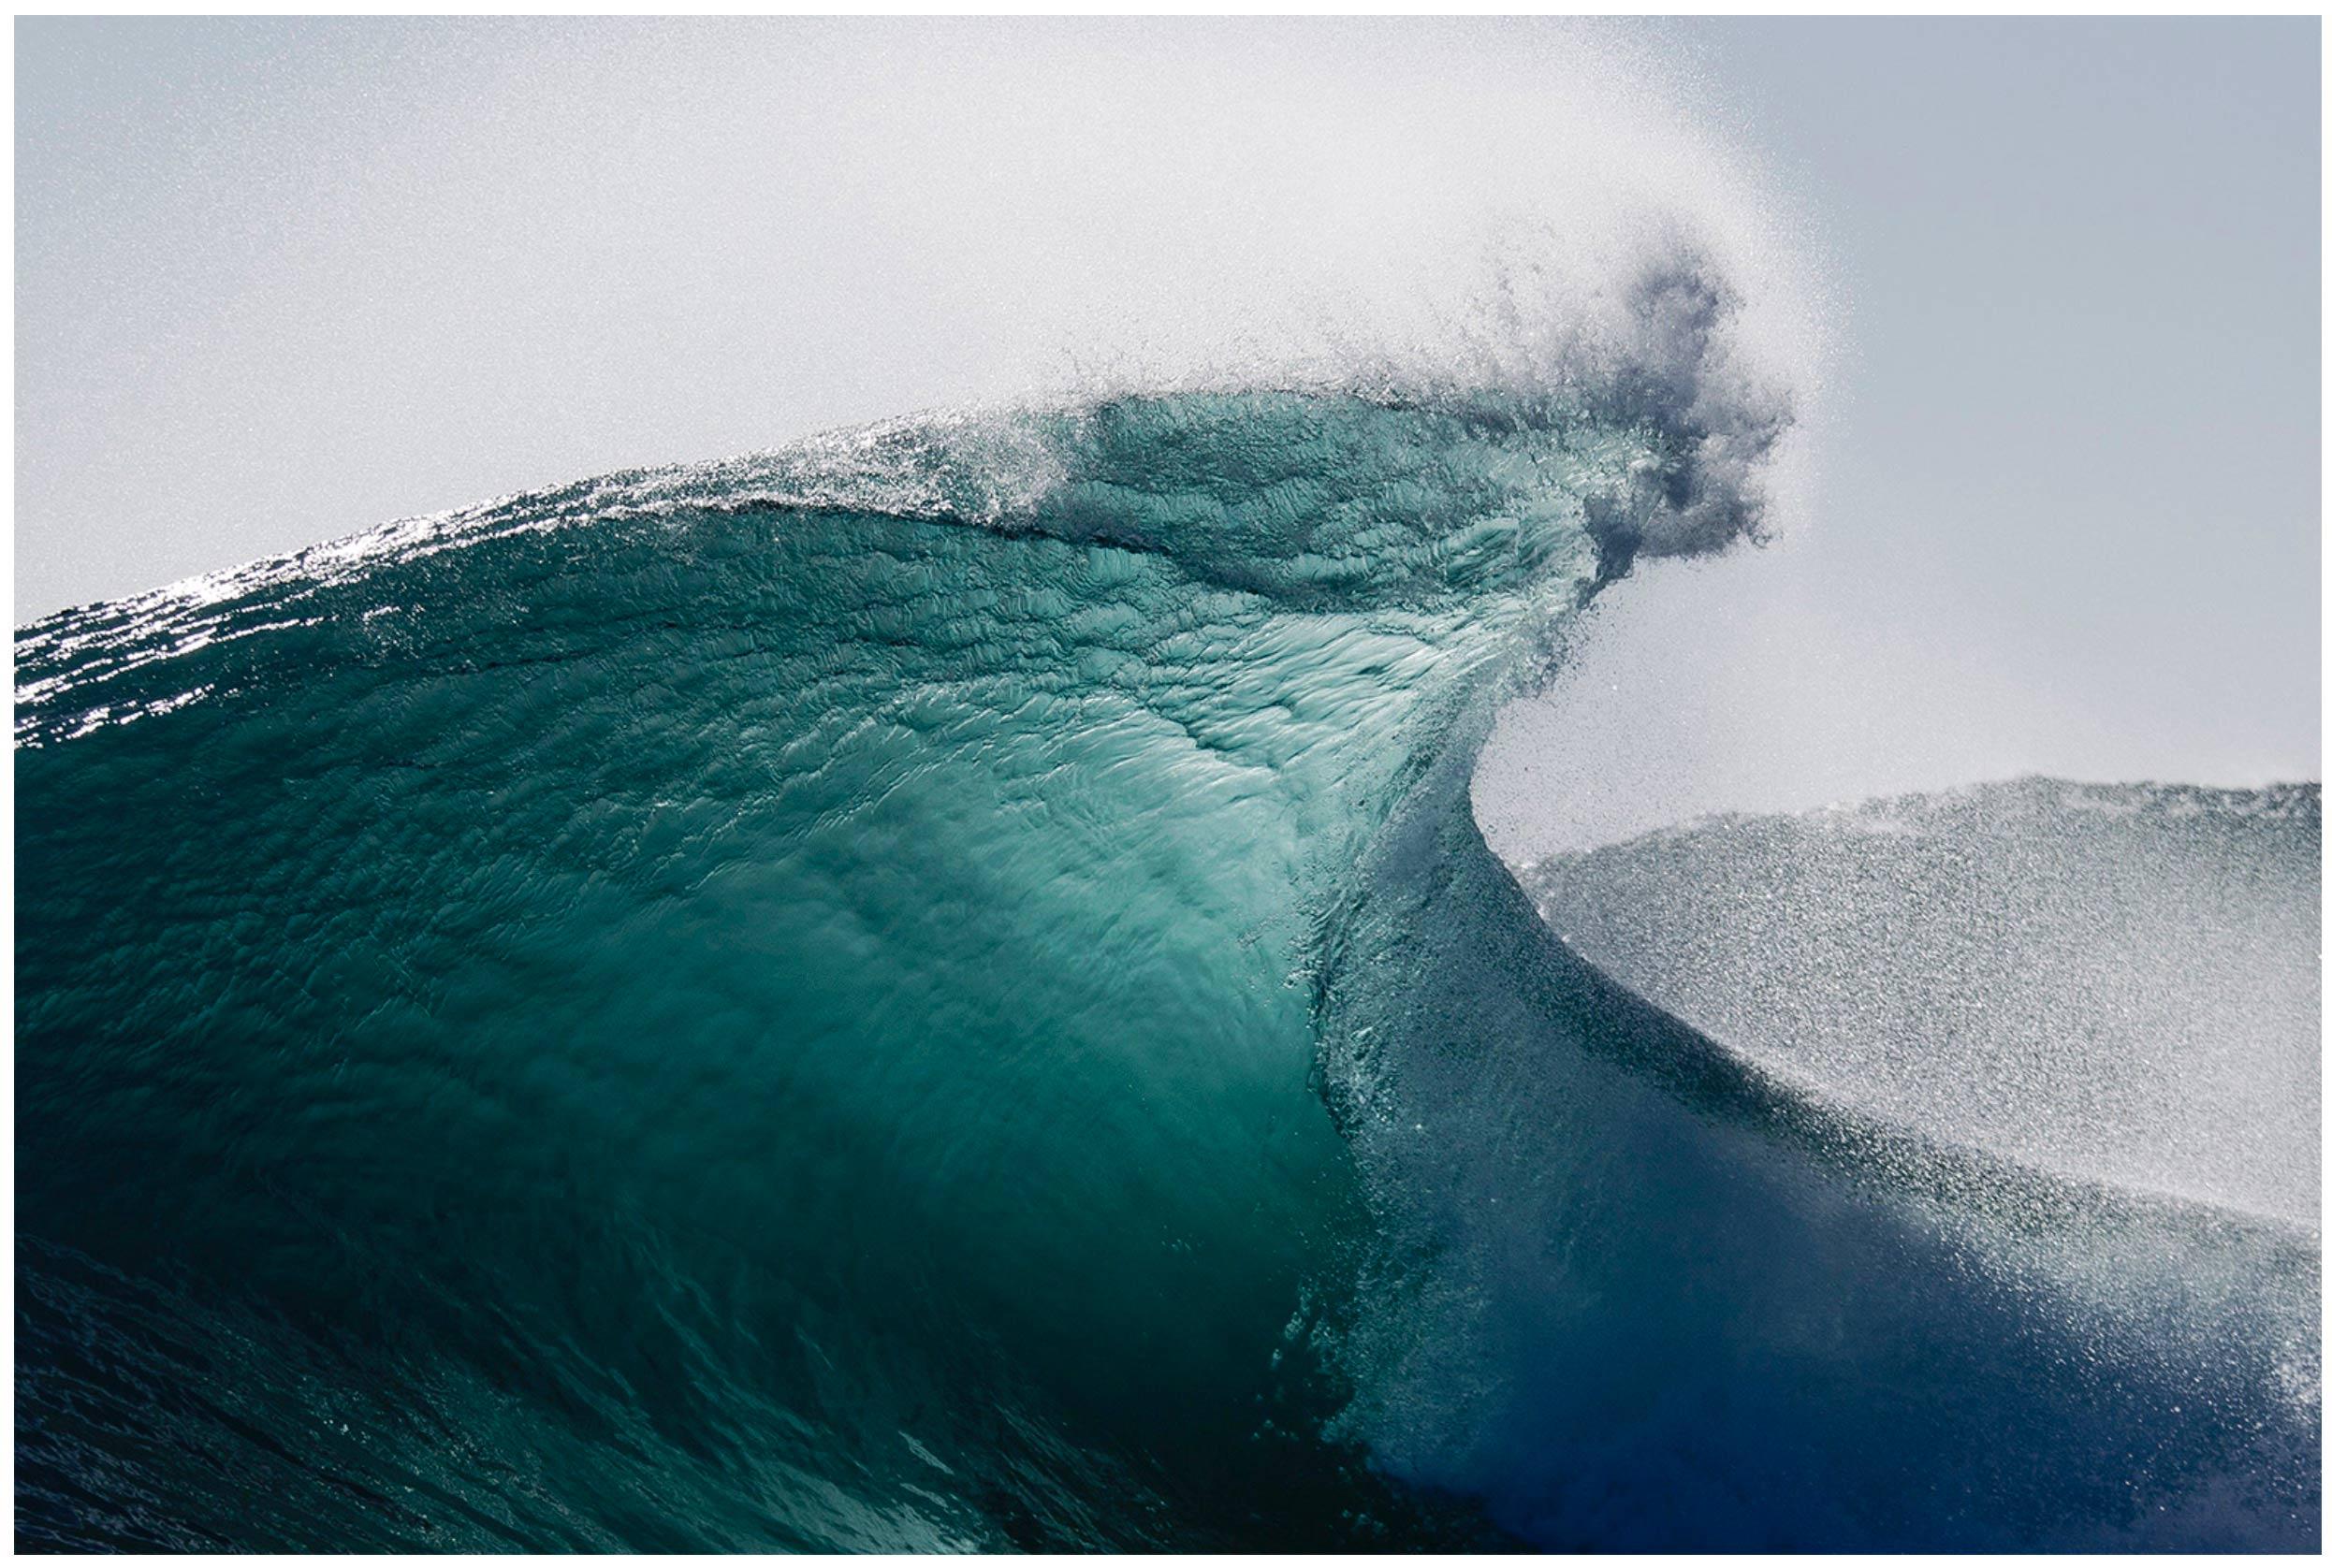 rodd-owen-ocean-surf-photography-for-sale-144.jpg